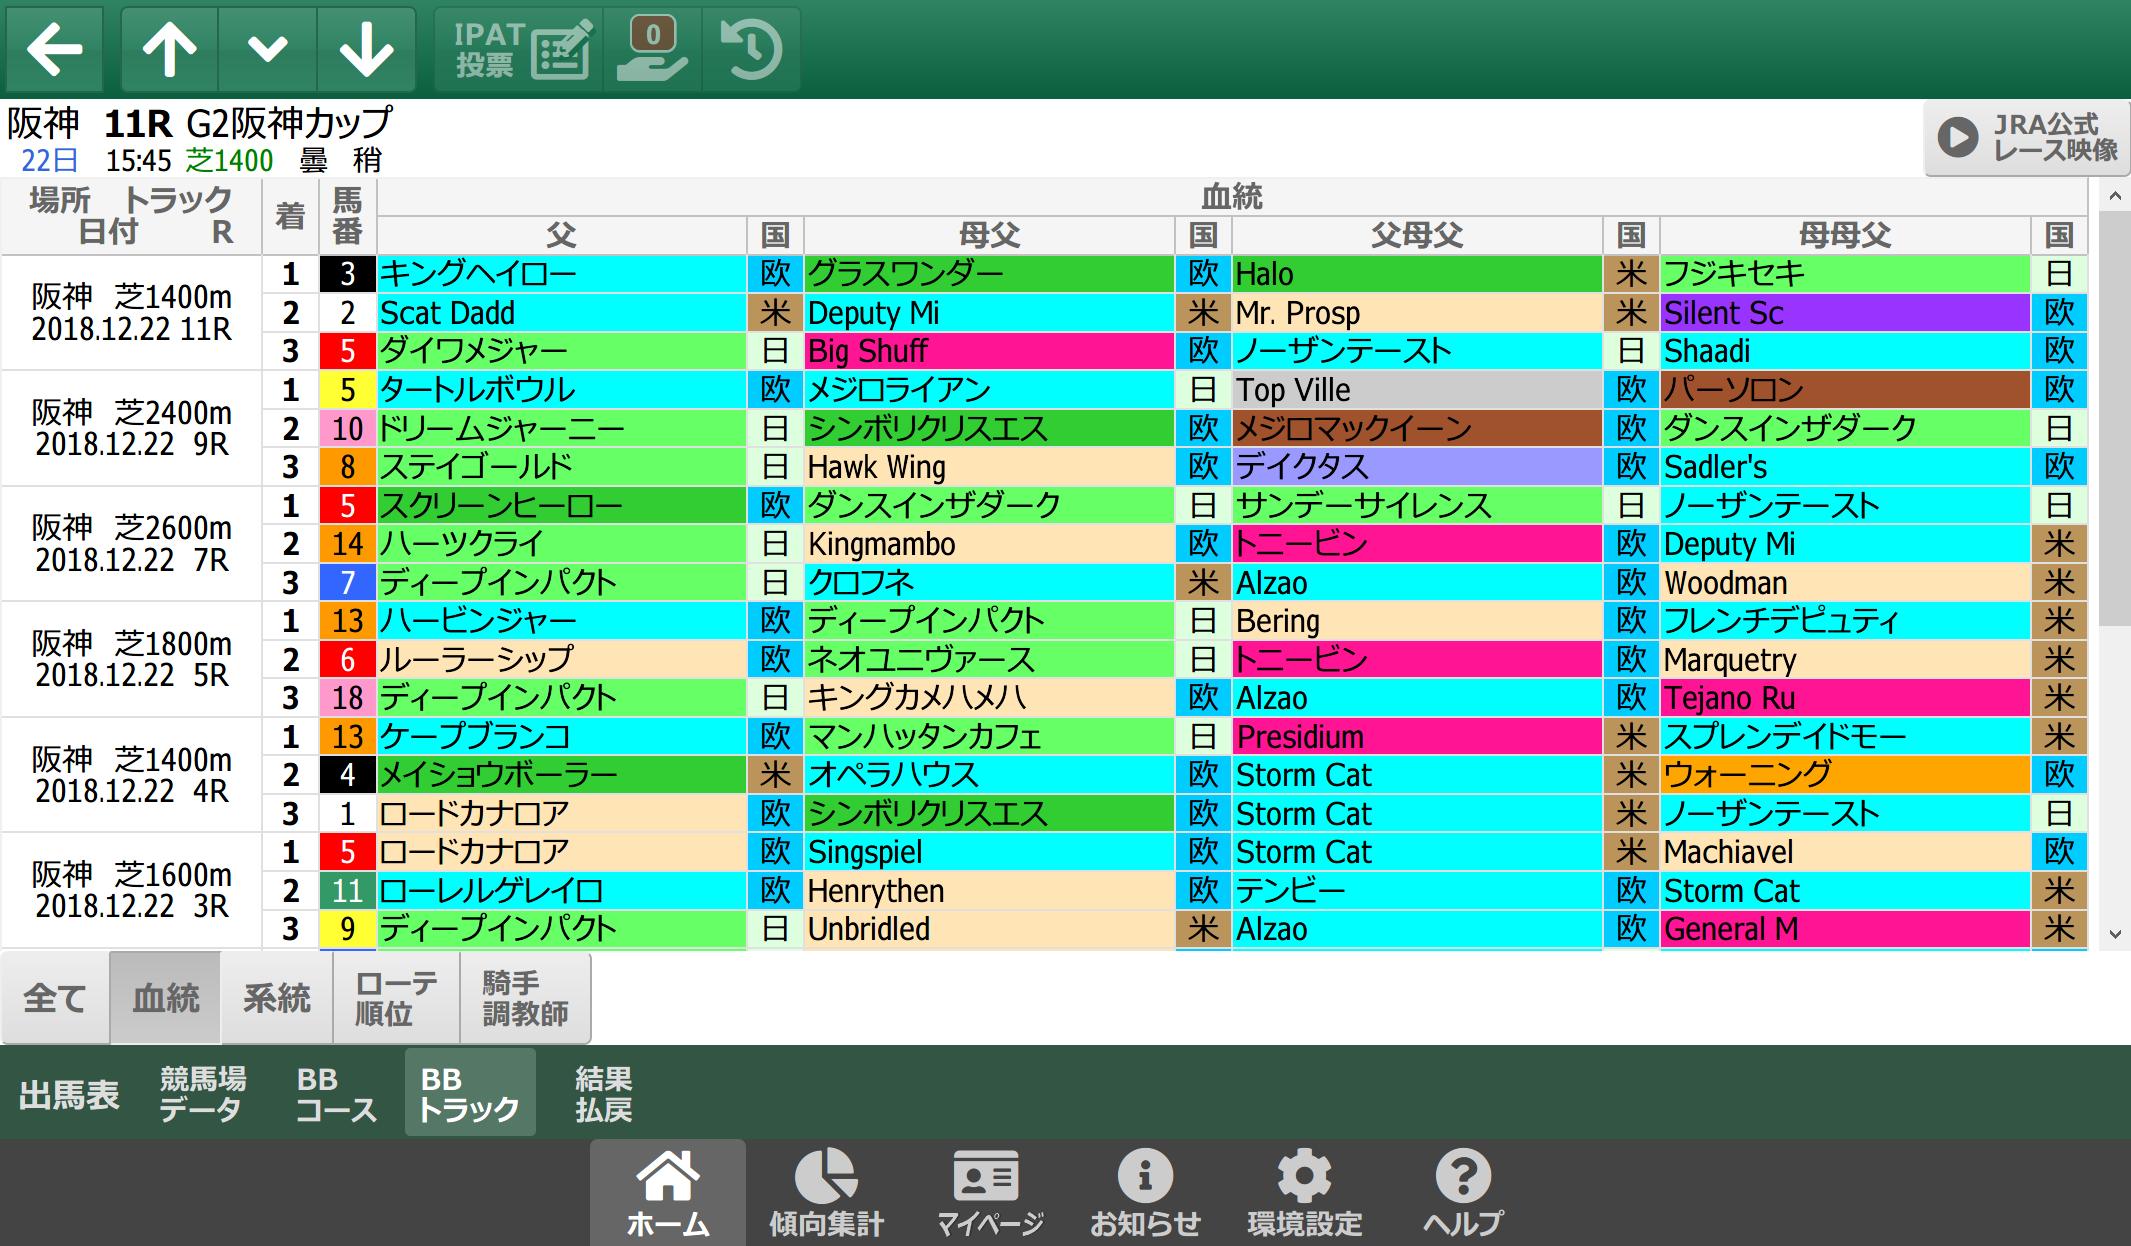 12/22(土)阪神競馬 1~3着内好走馬の傾向(血統・系統・ローテ・パターン・騎手・調教師)